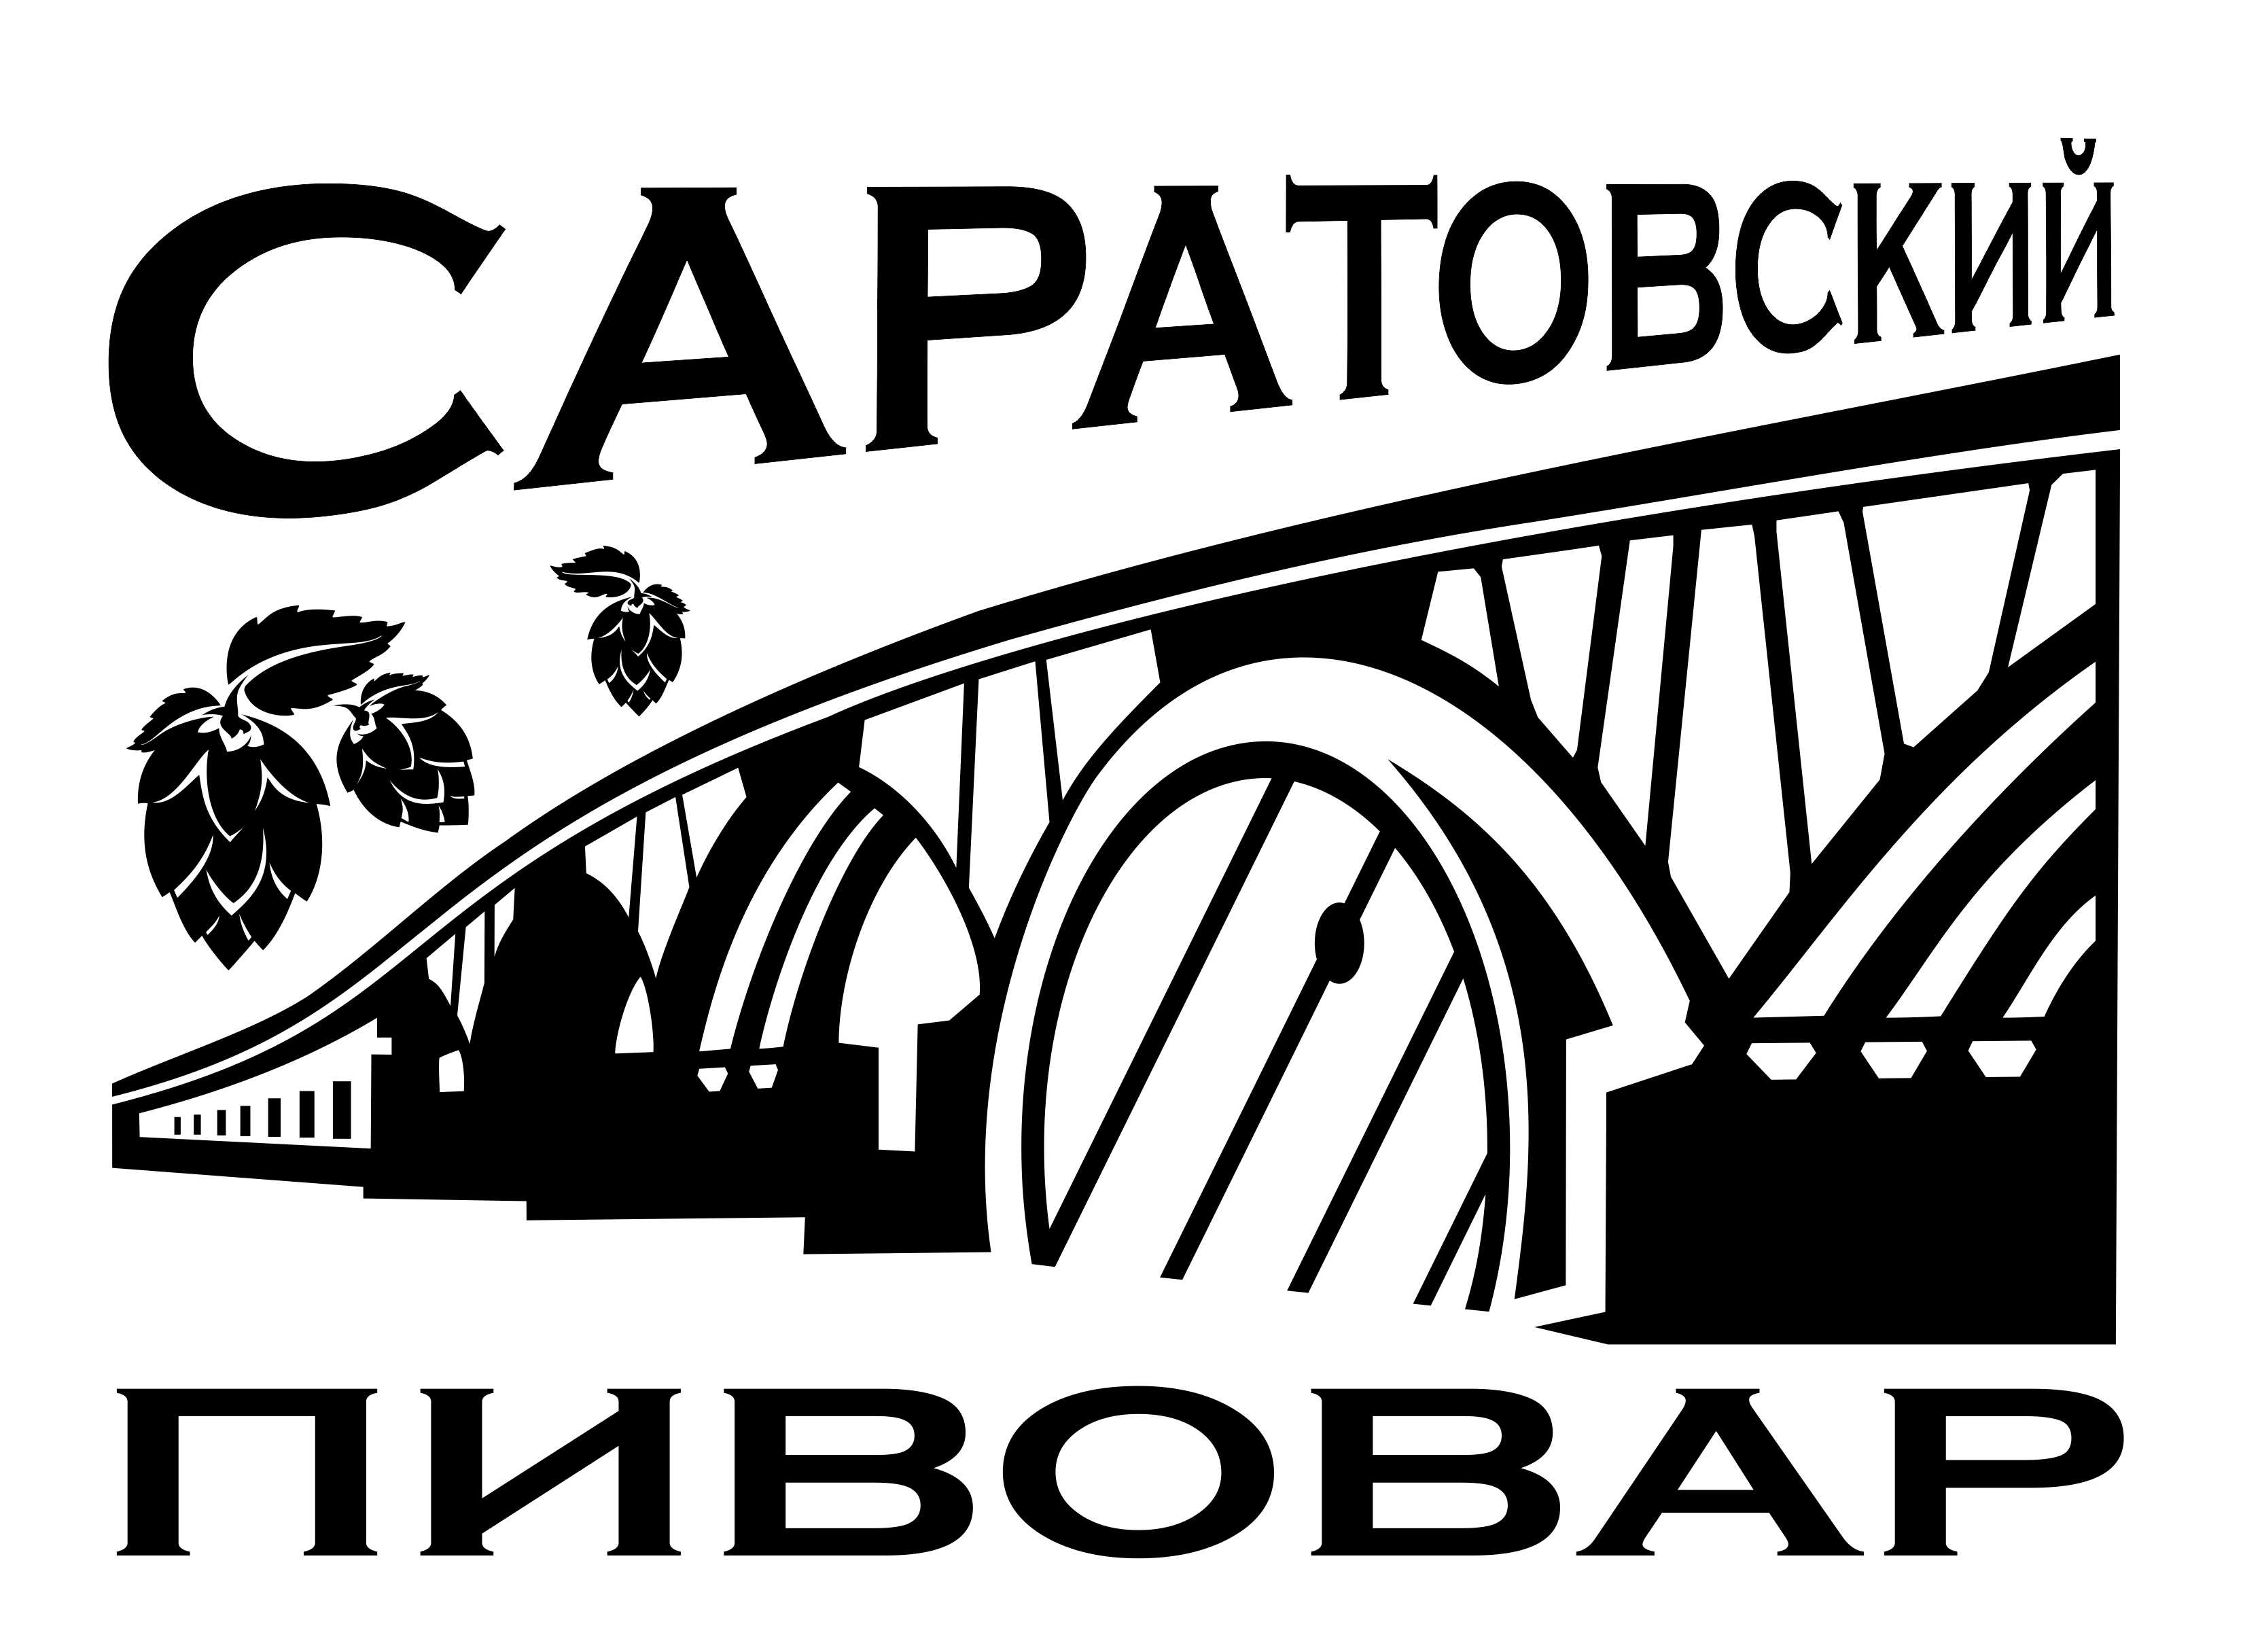 Разработка логотипа для частной пивоварни фото f_1605d766ea0dfcf8.jpg